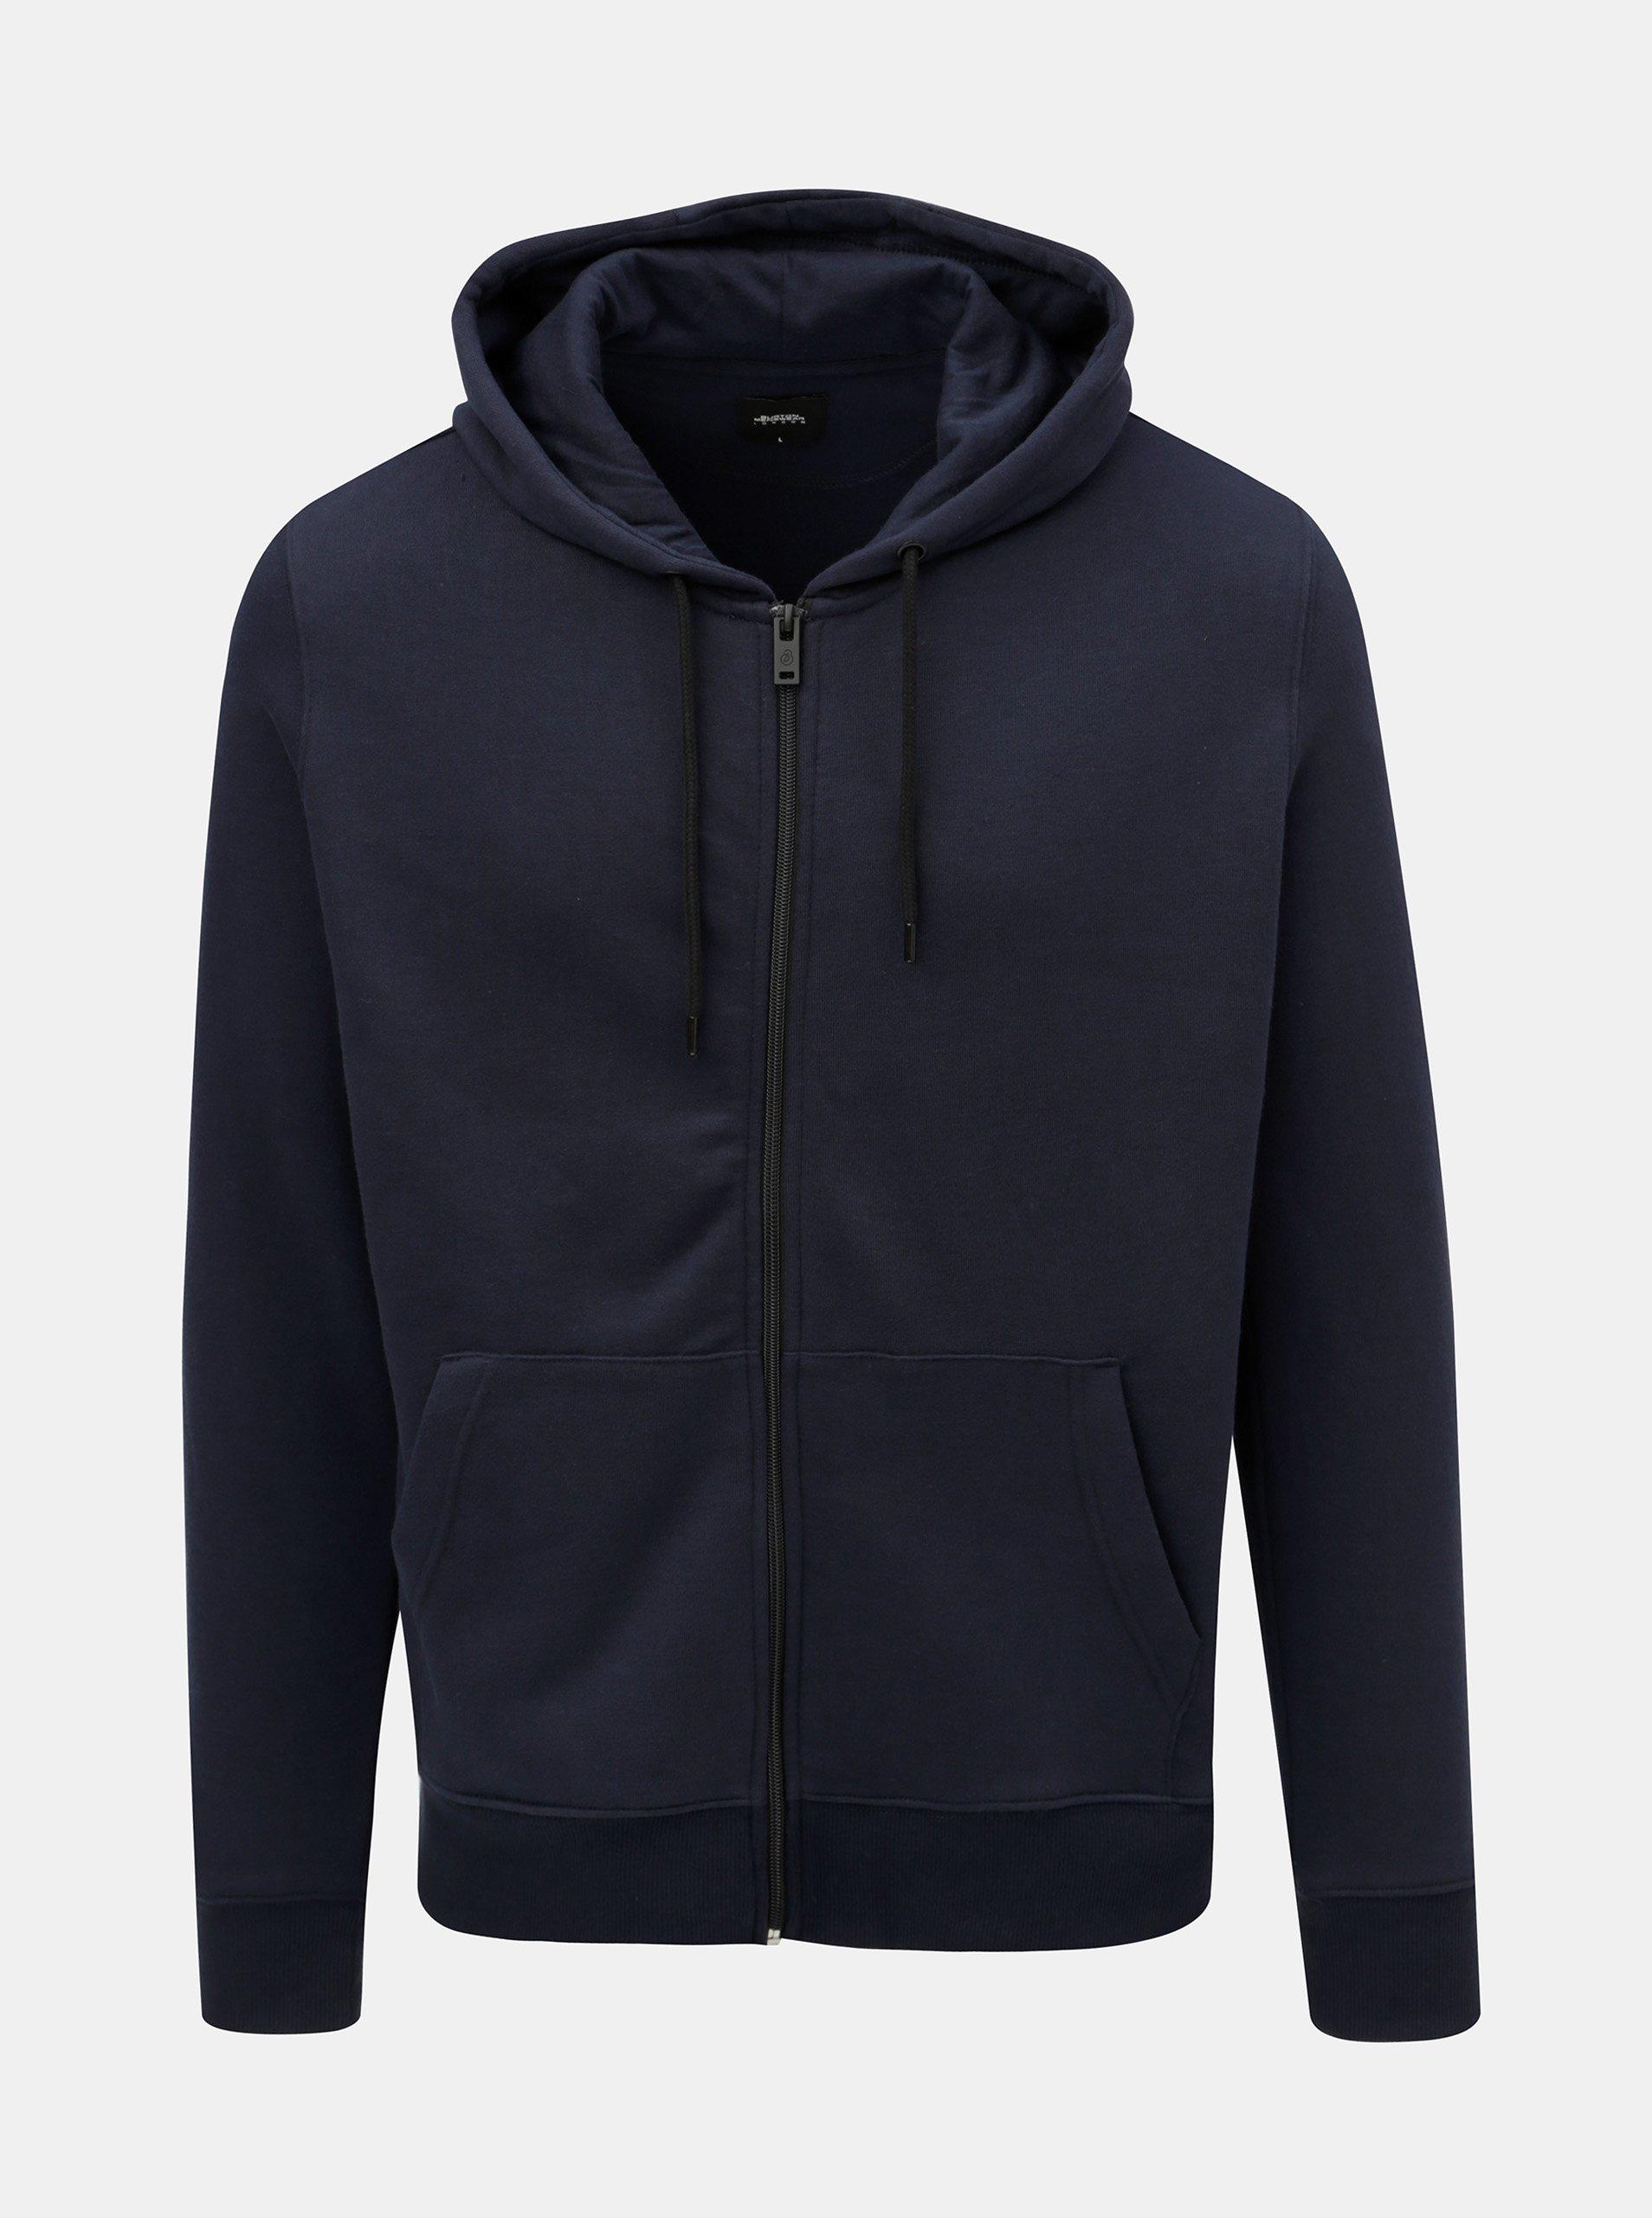 15401ad336 Tmavě modrá mikina s kapucí na zip Burton Menswear London